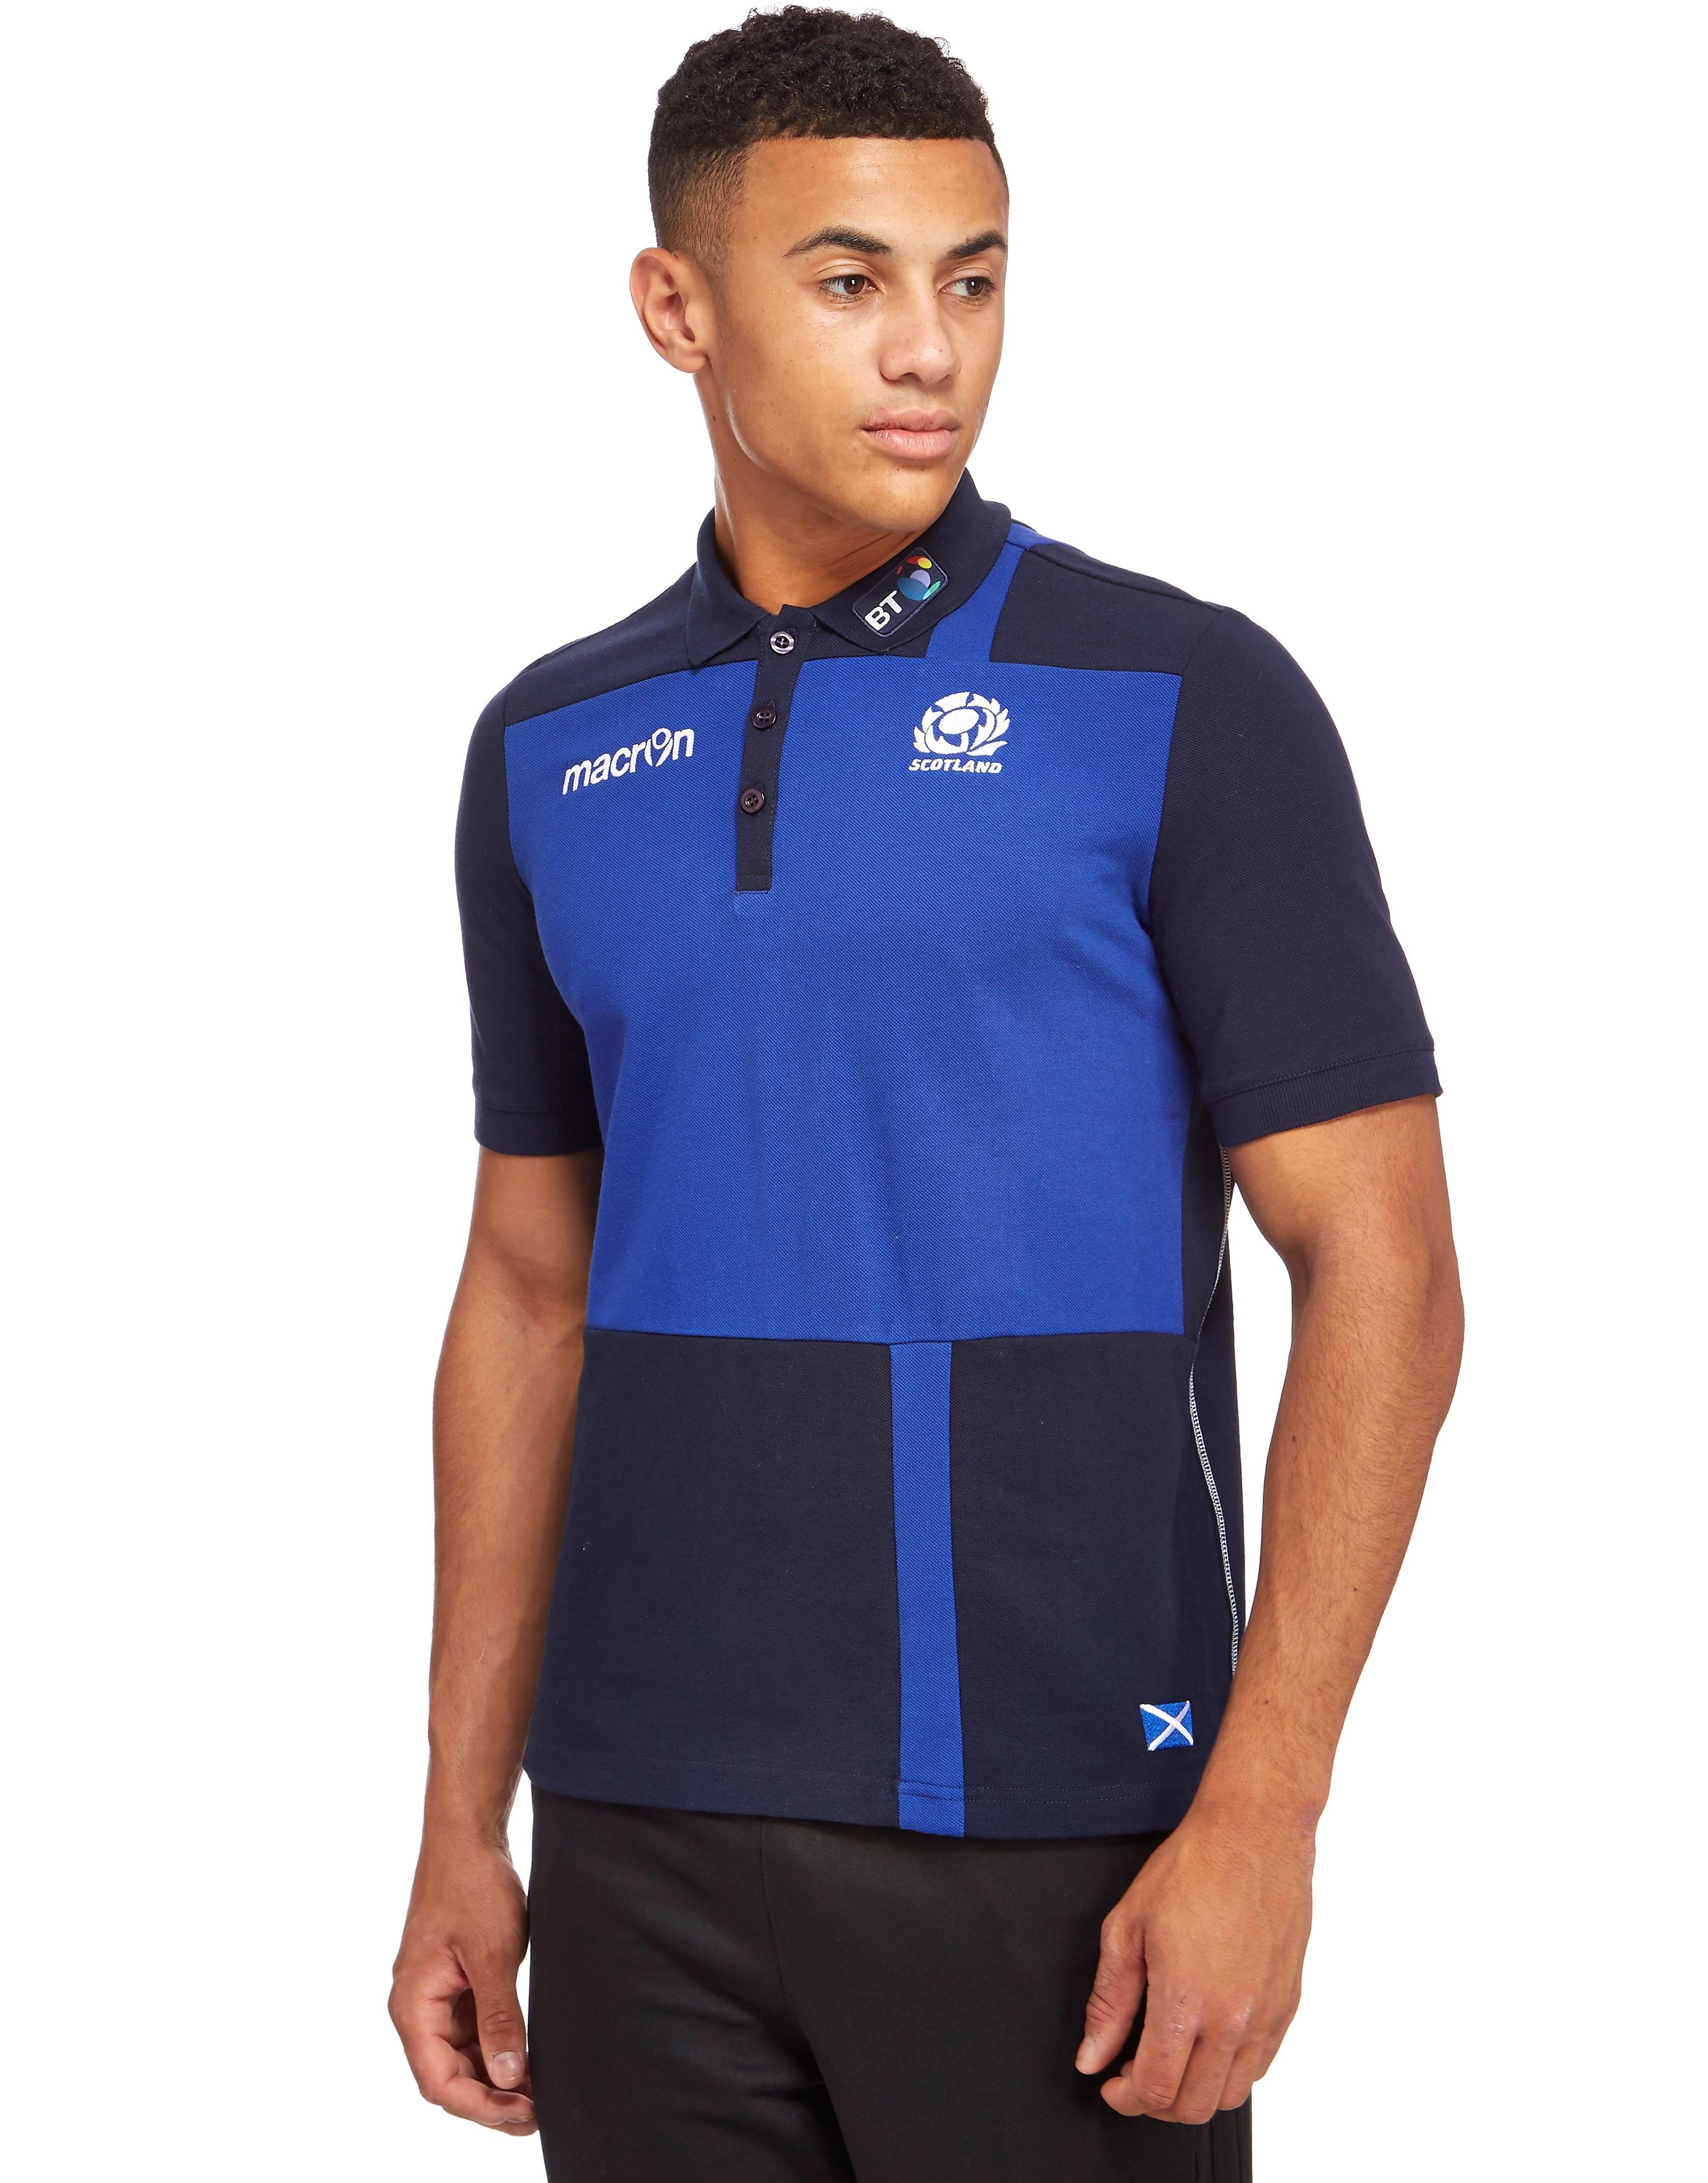 Macron Scotland Rugby Union Leisure Polo Shirt